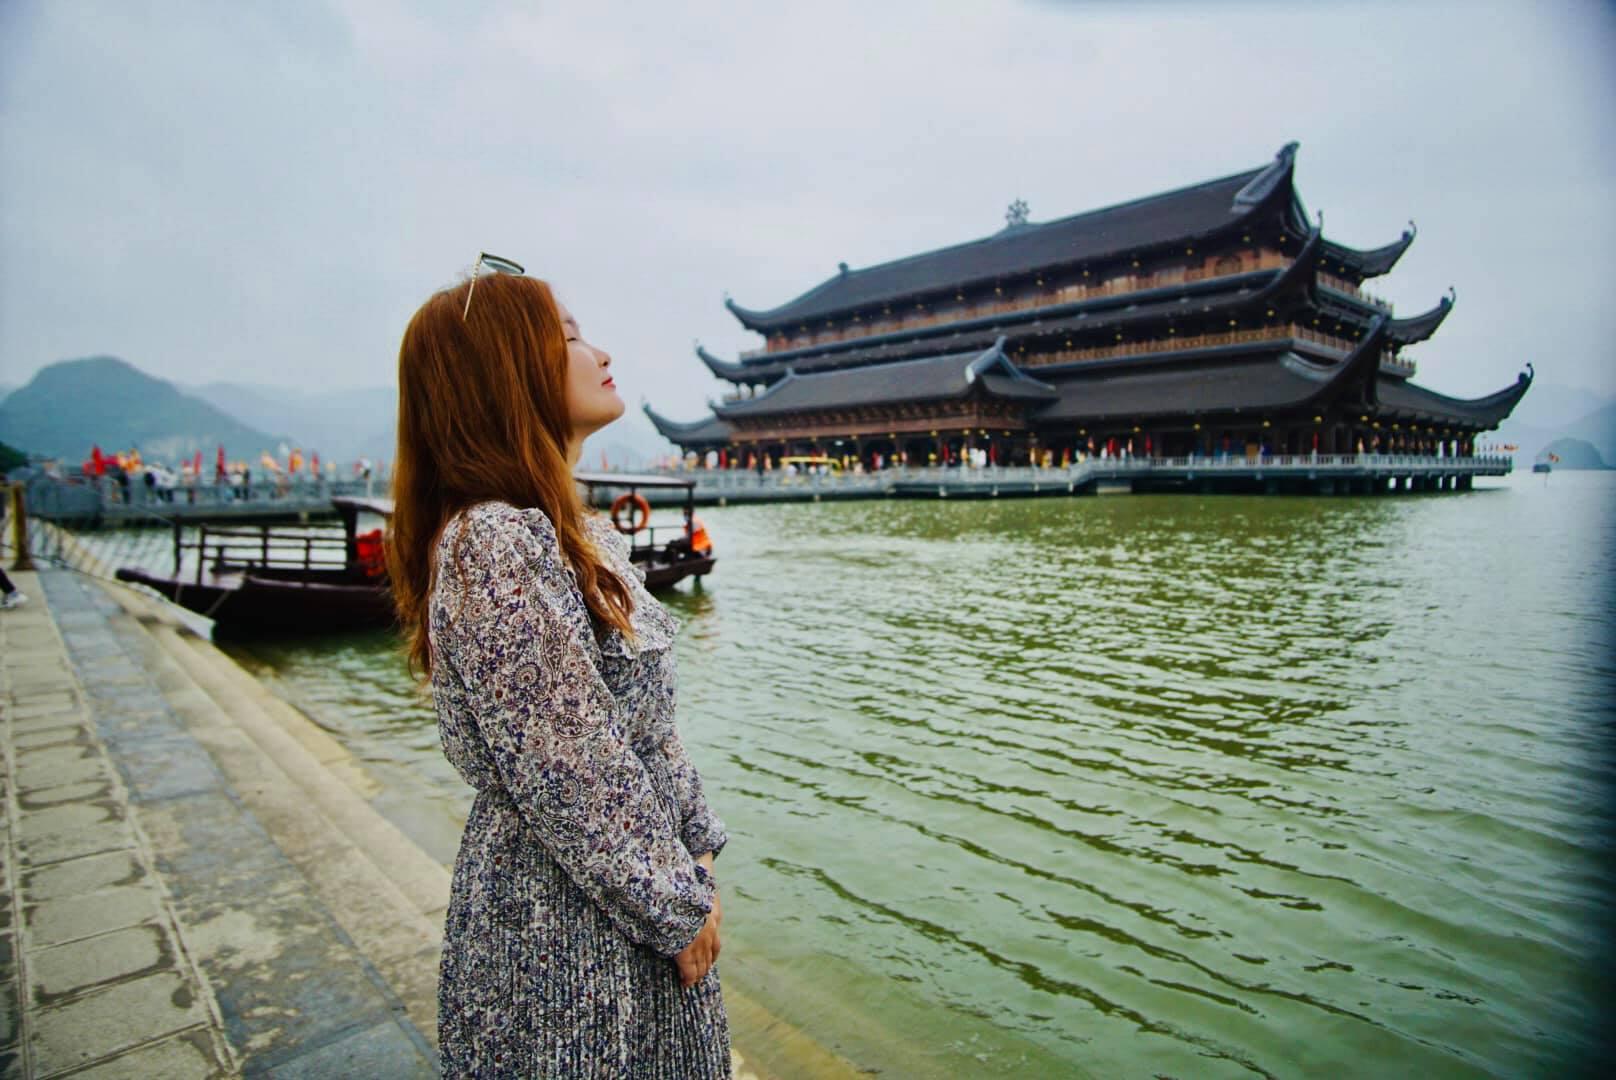 tam chuc pagoda waterside view